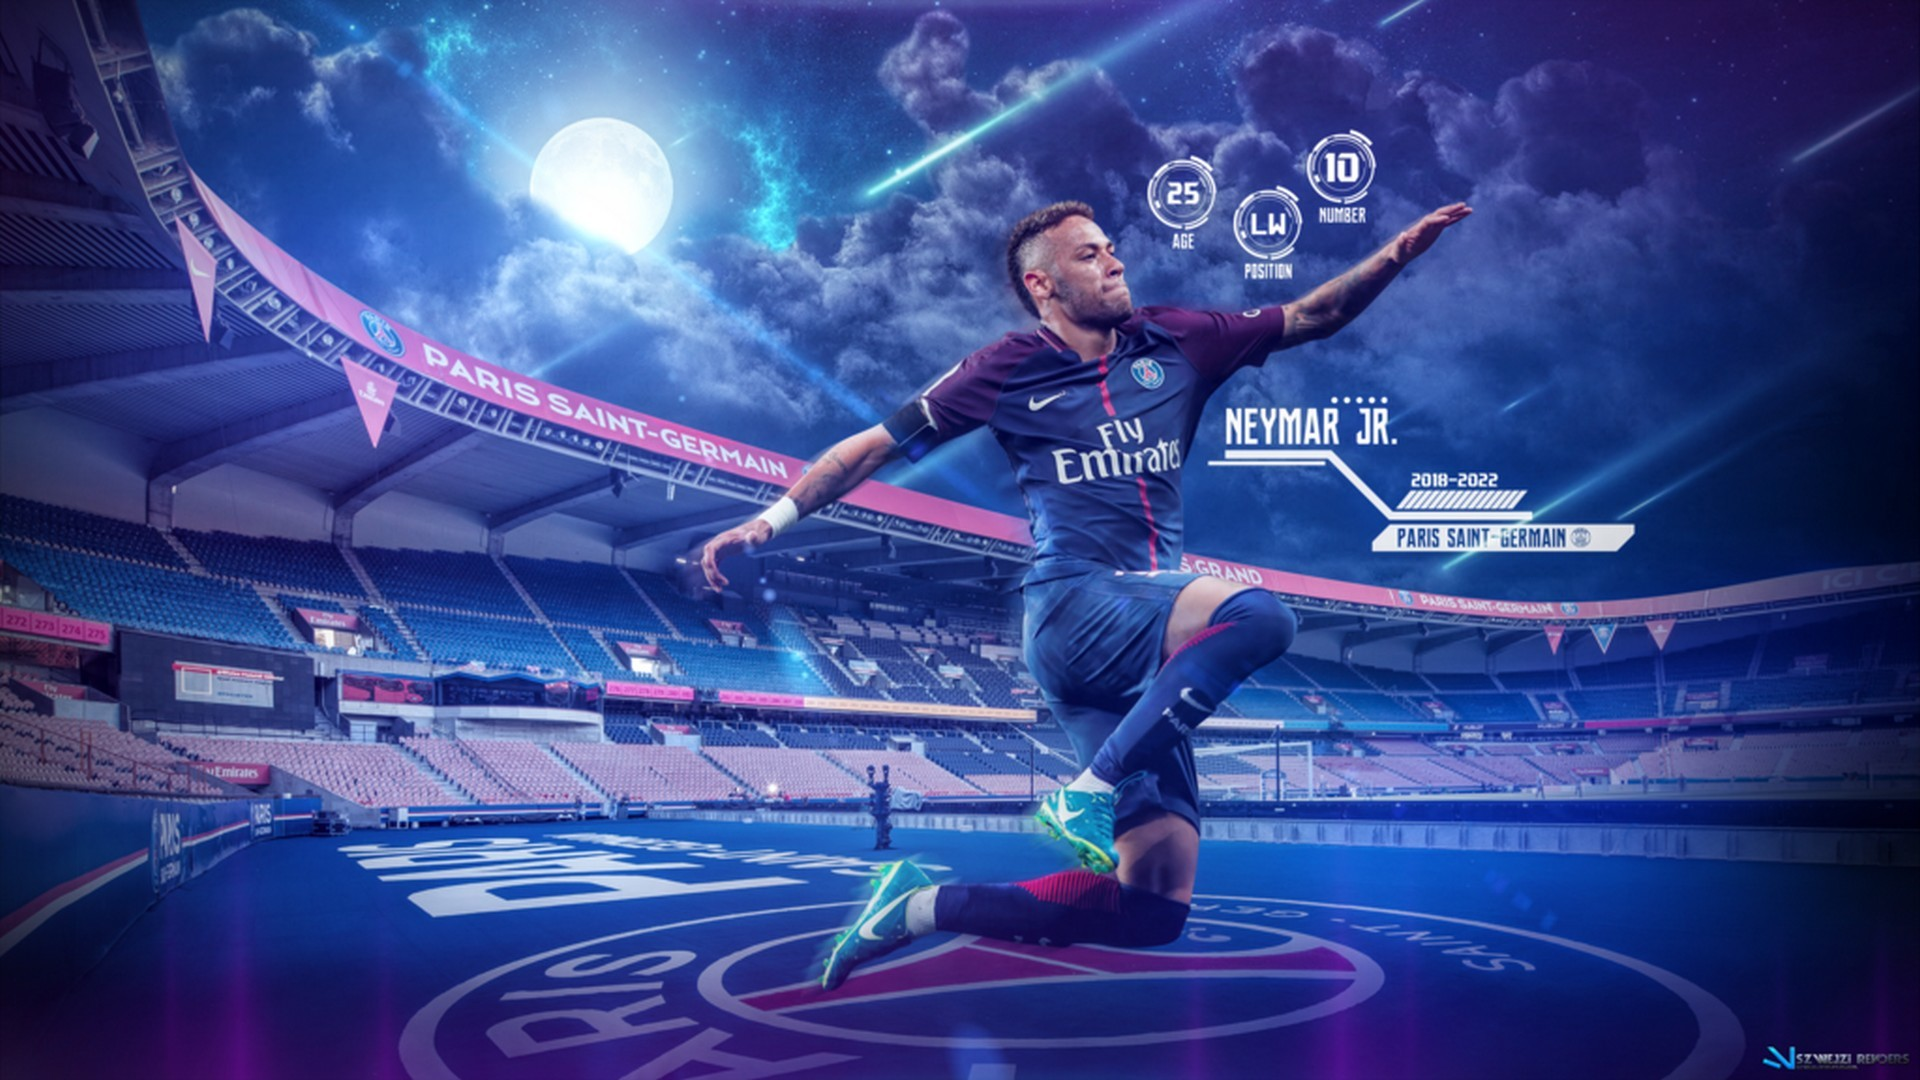 Neymar Hd Wallpaper 2018 79 Images